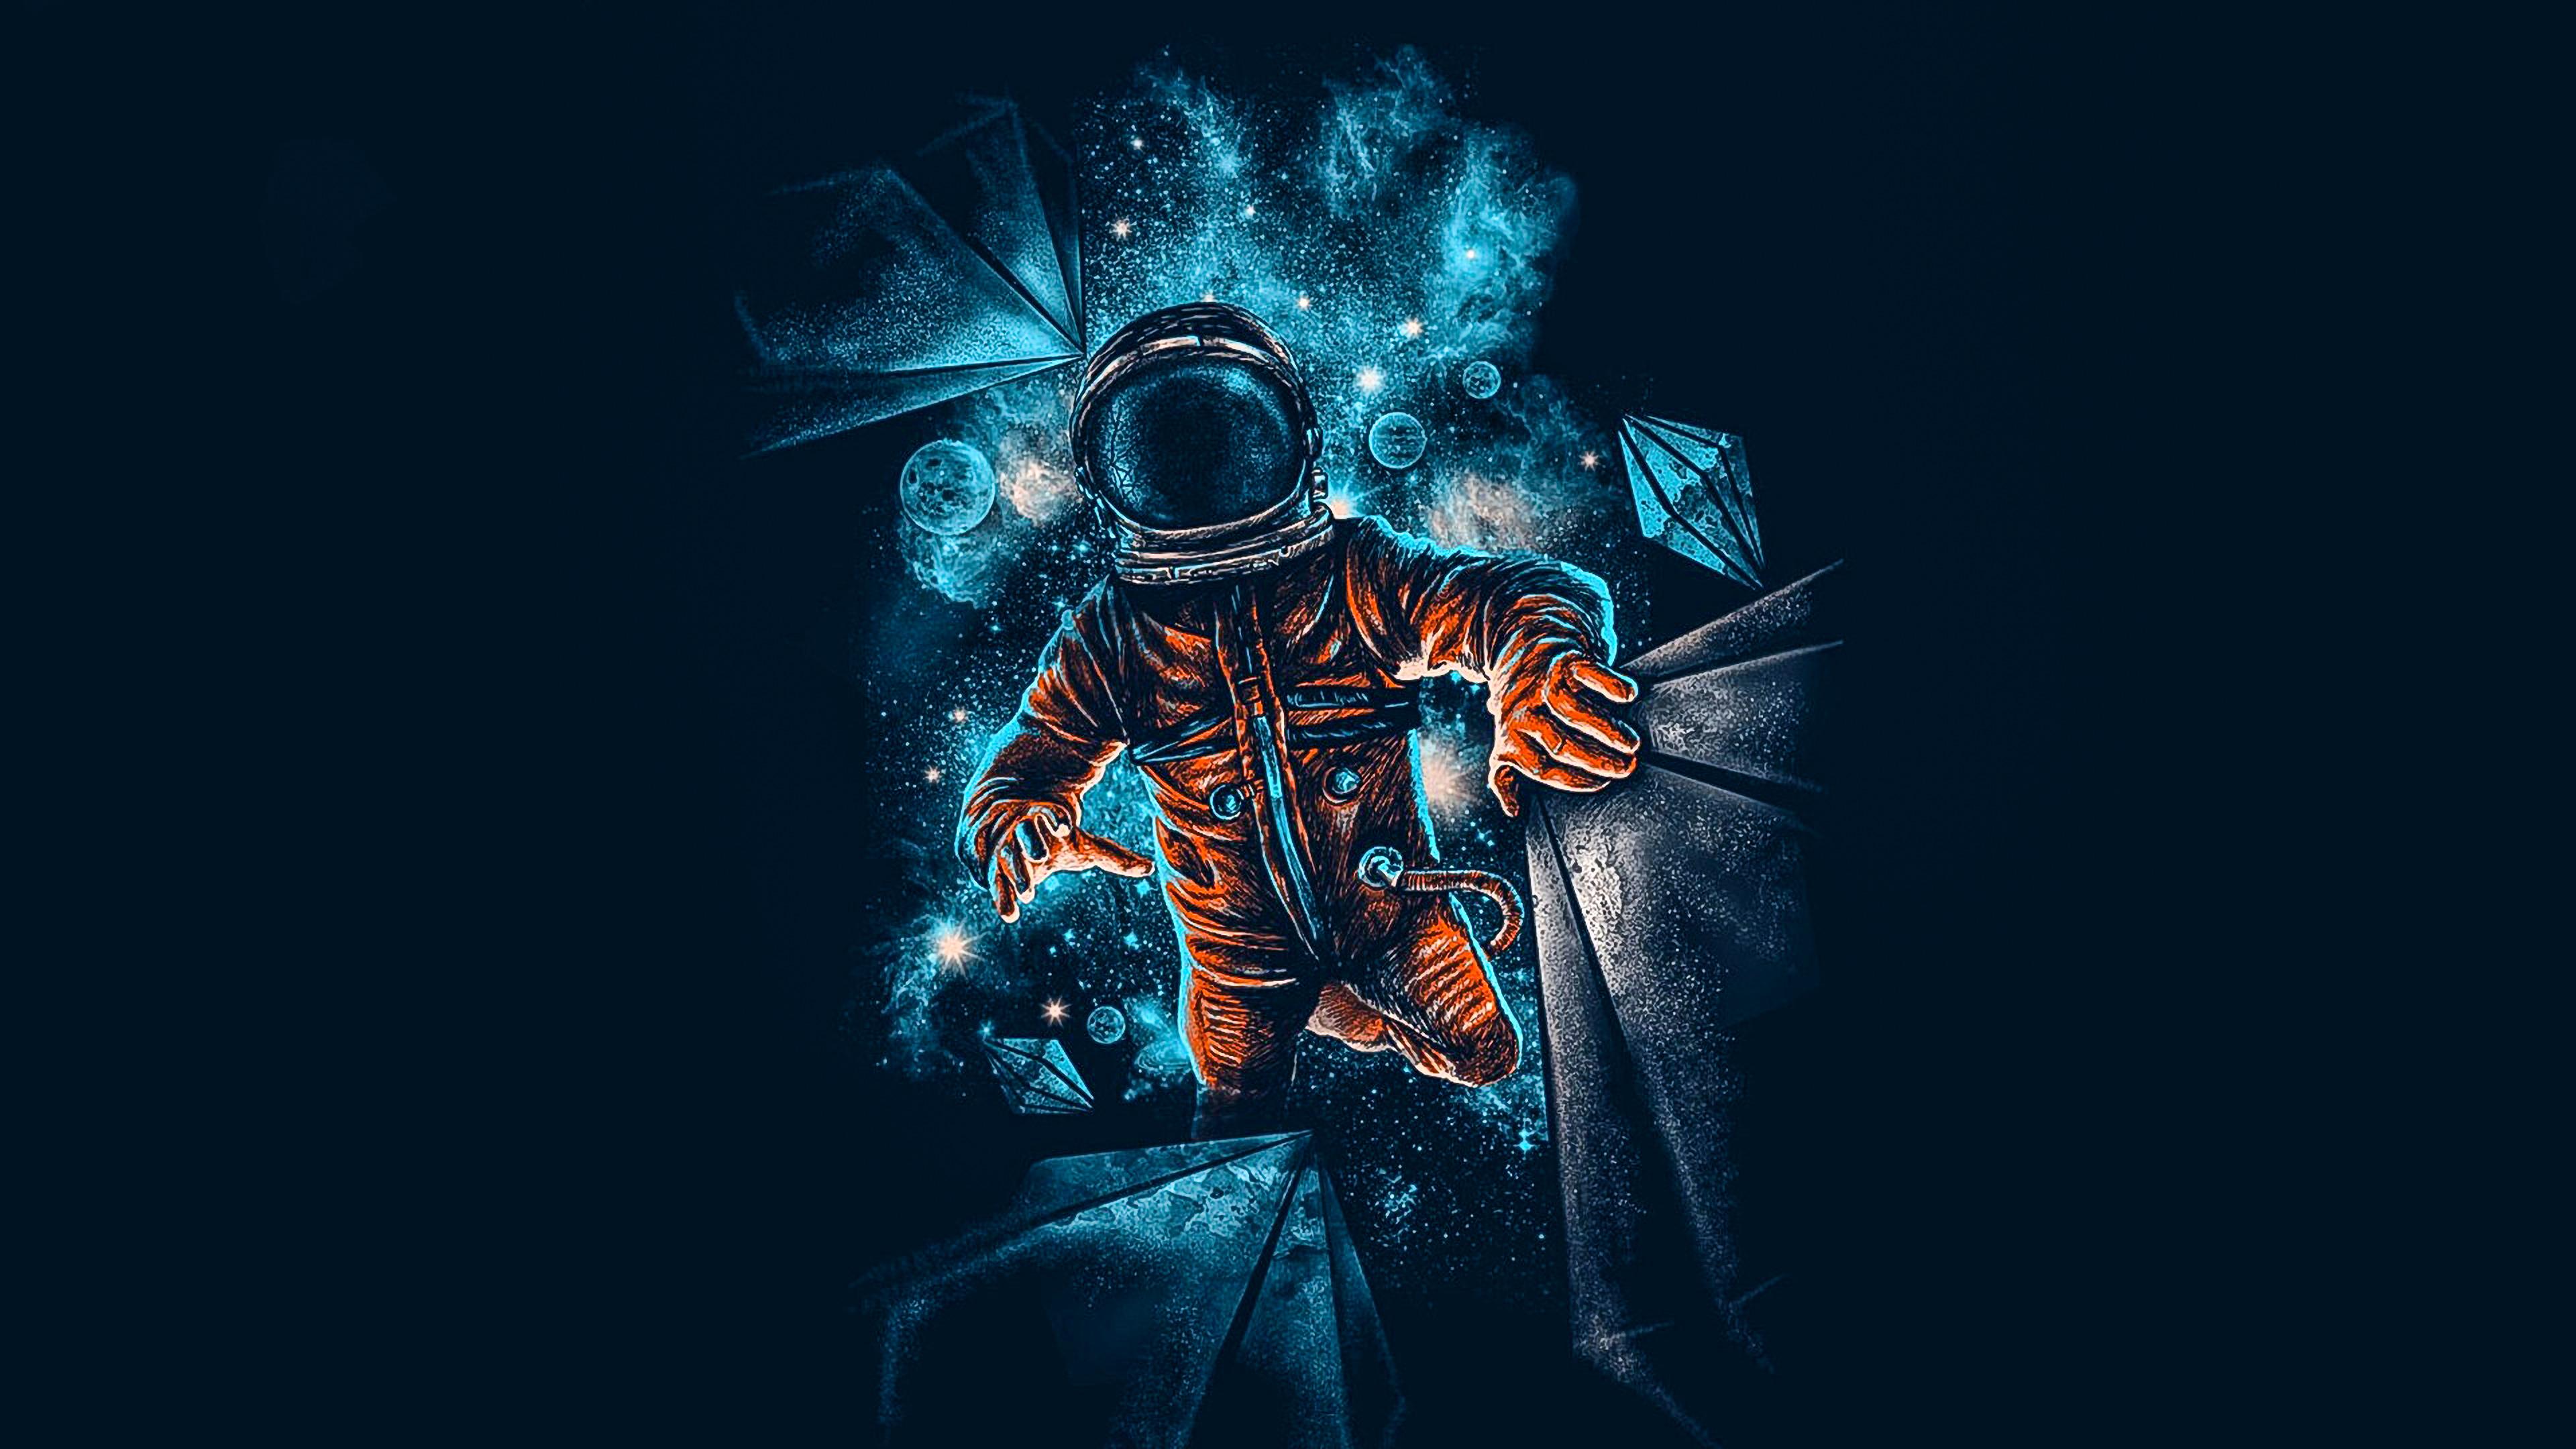 Artistic Spaceman Blue Orange 4k Wallpaper Best Wallpapers